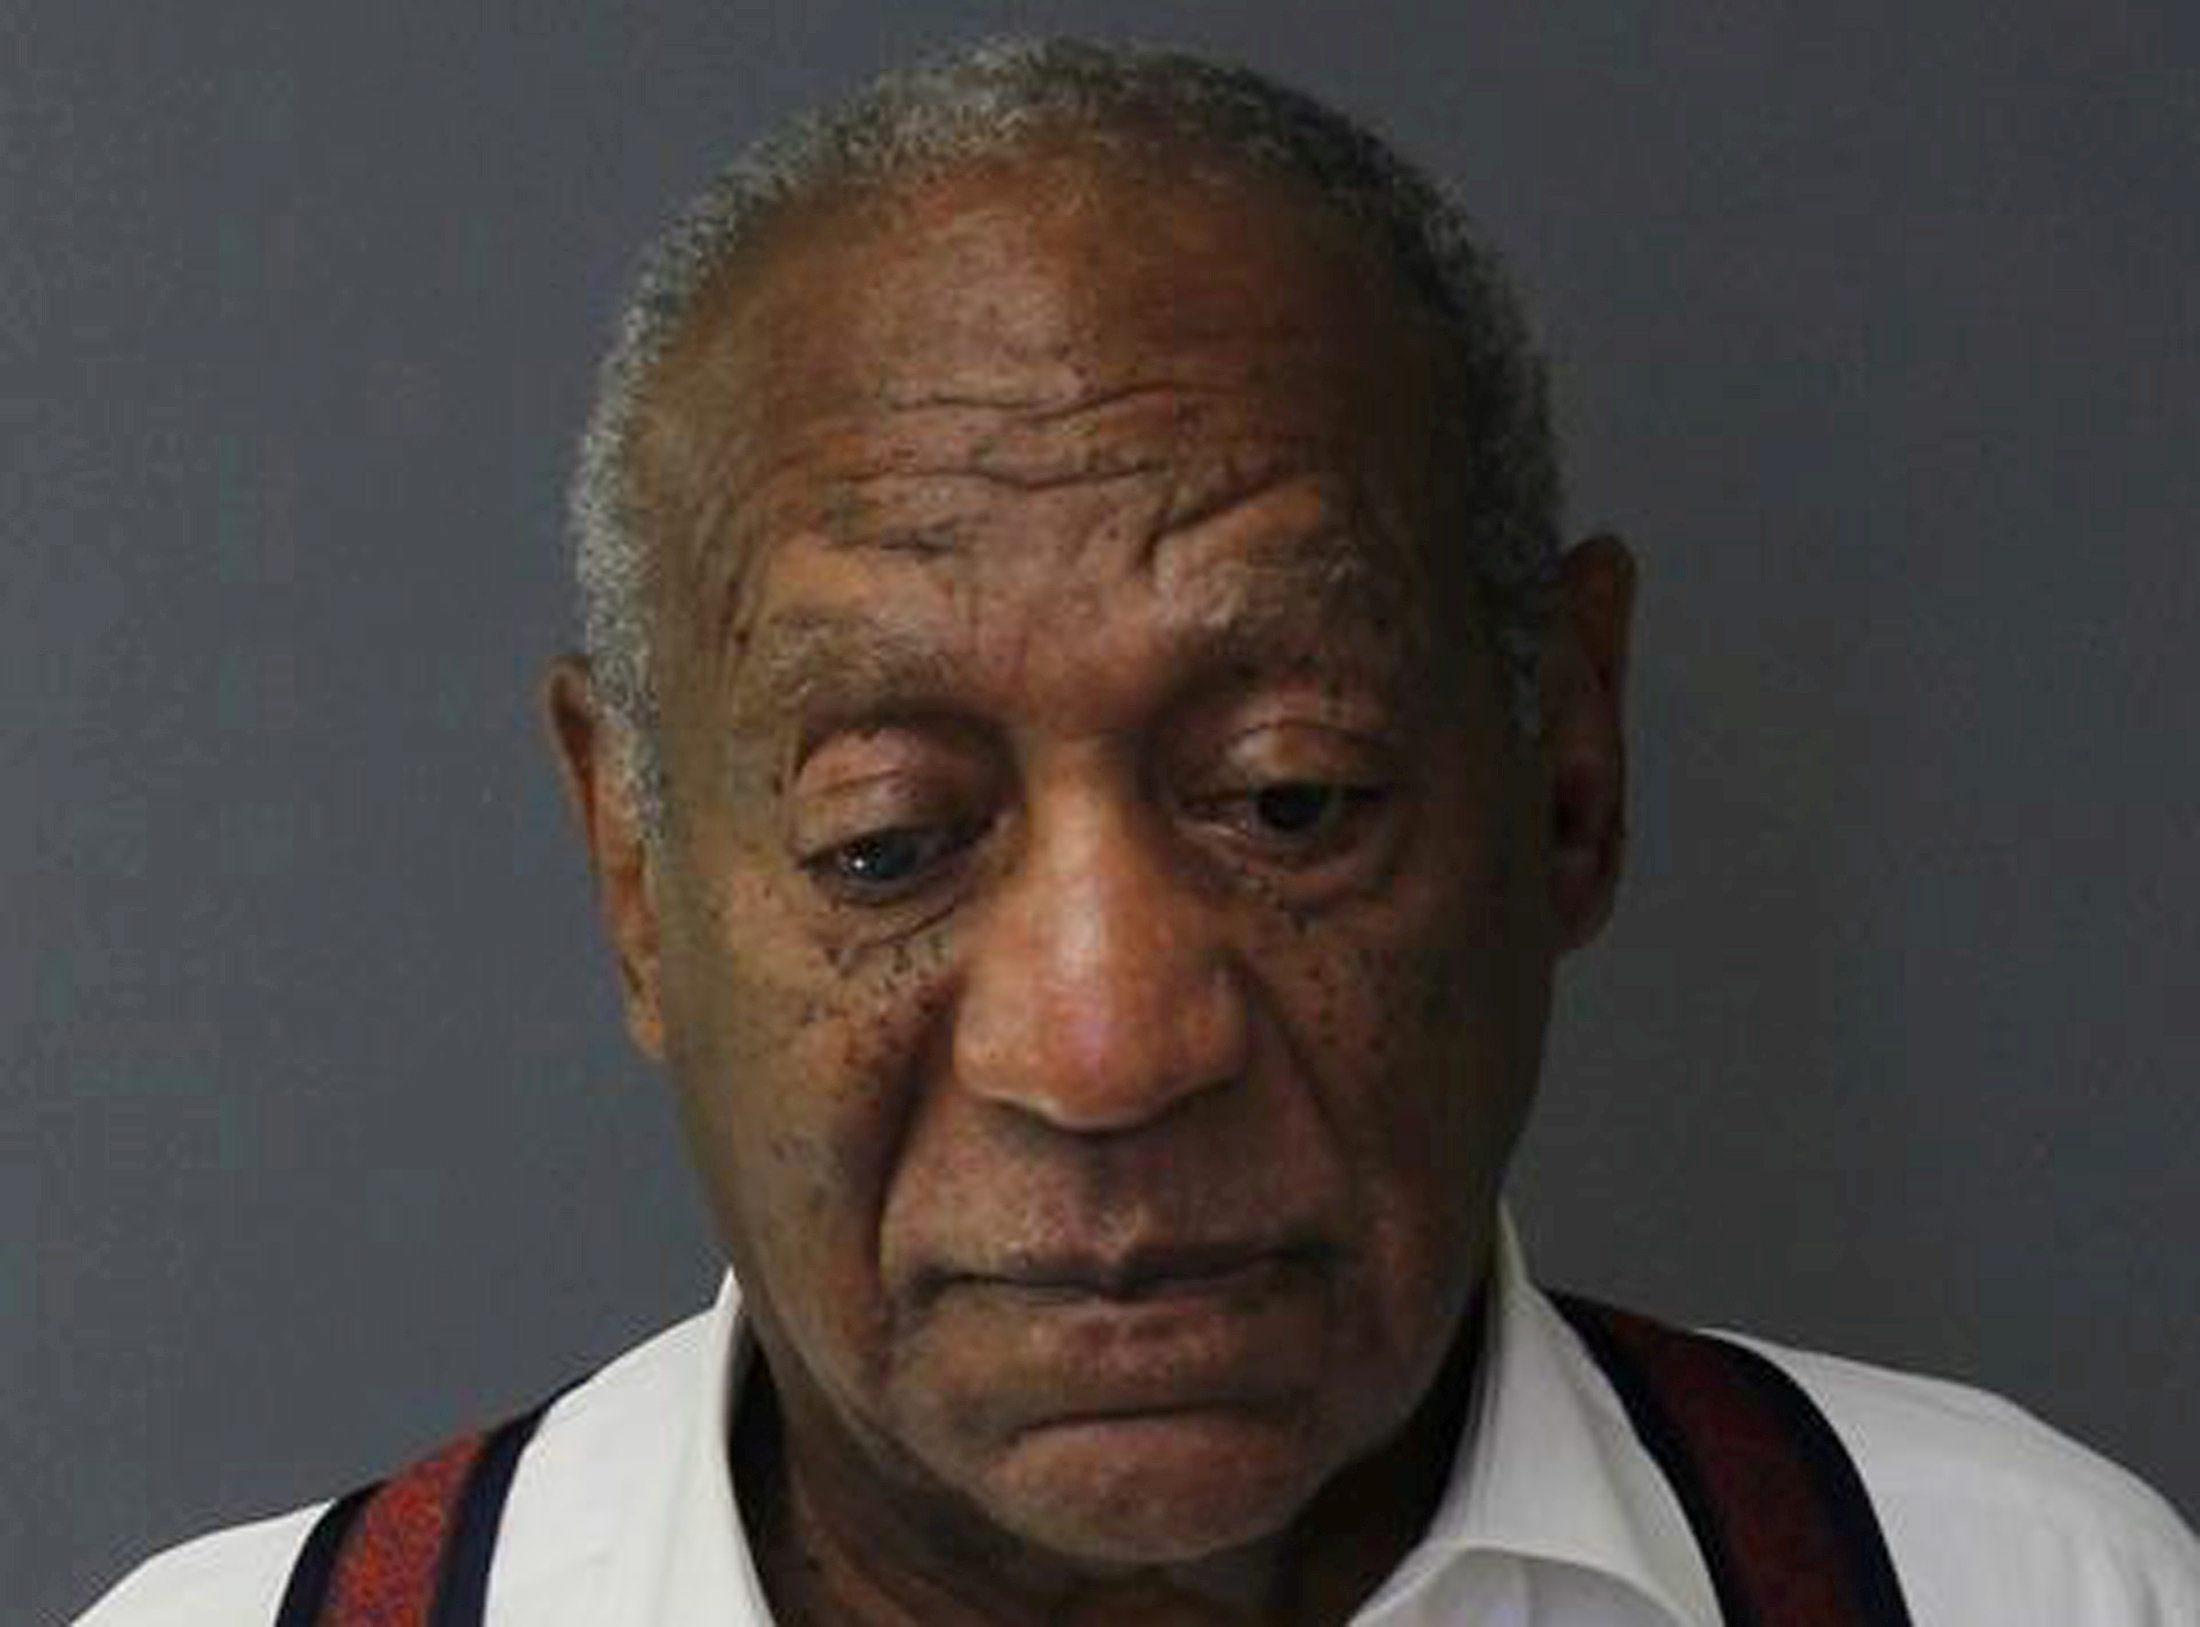 Zatvorska fotografija Billa Cosbyja